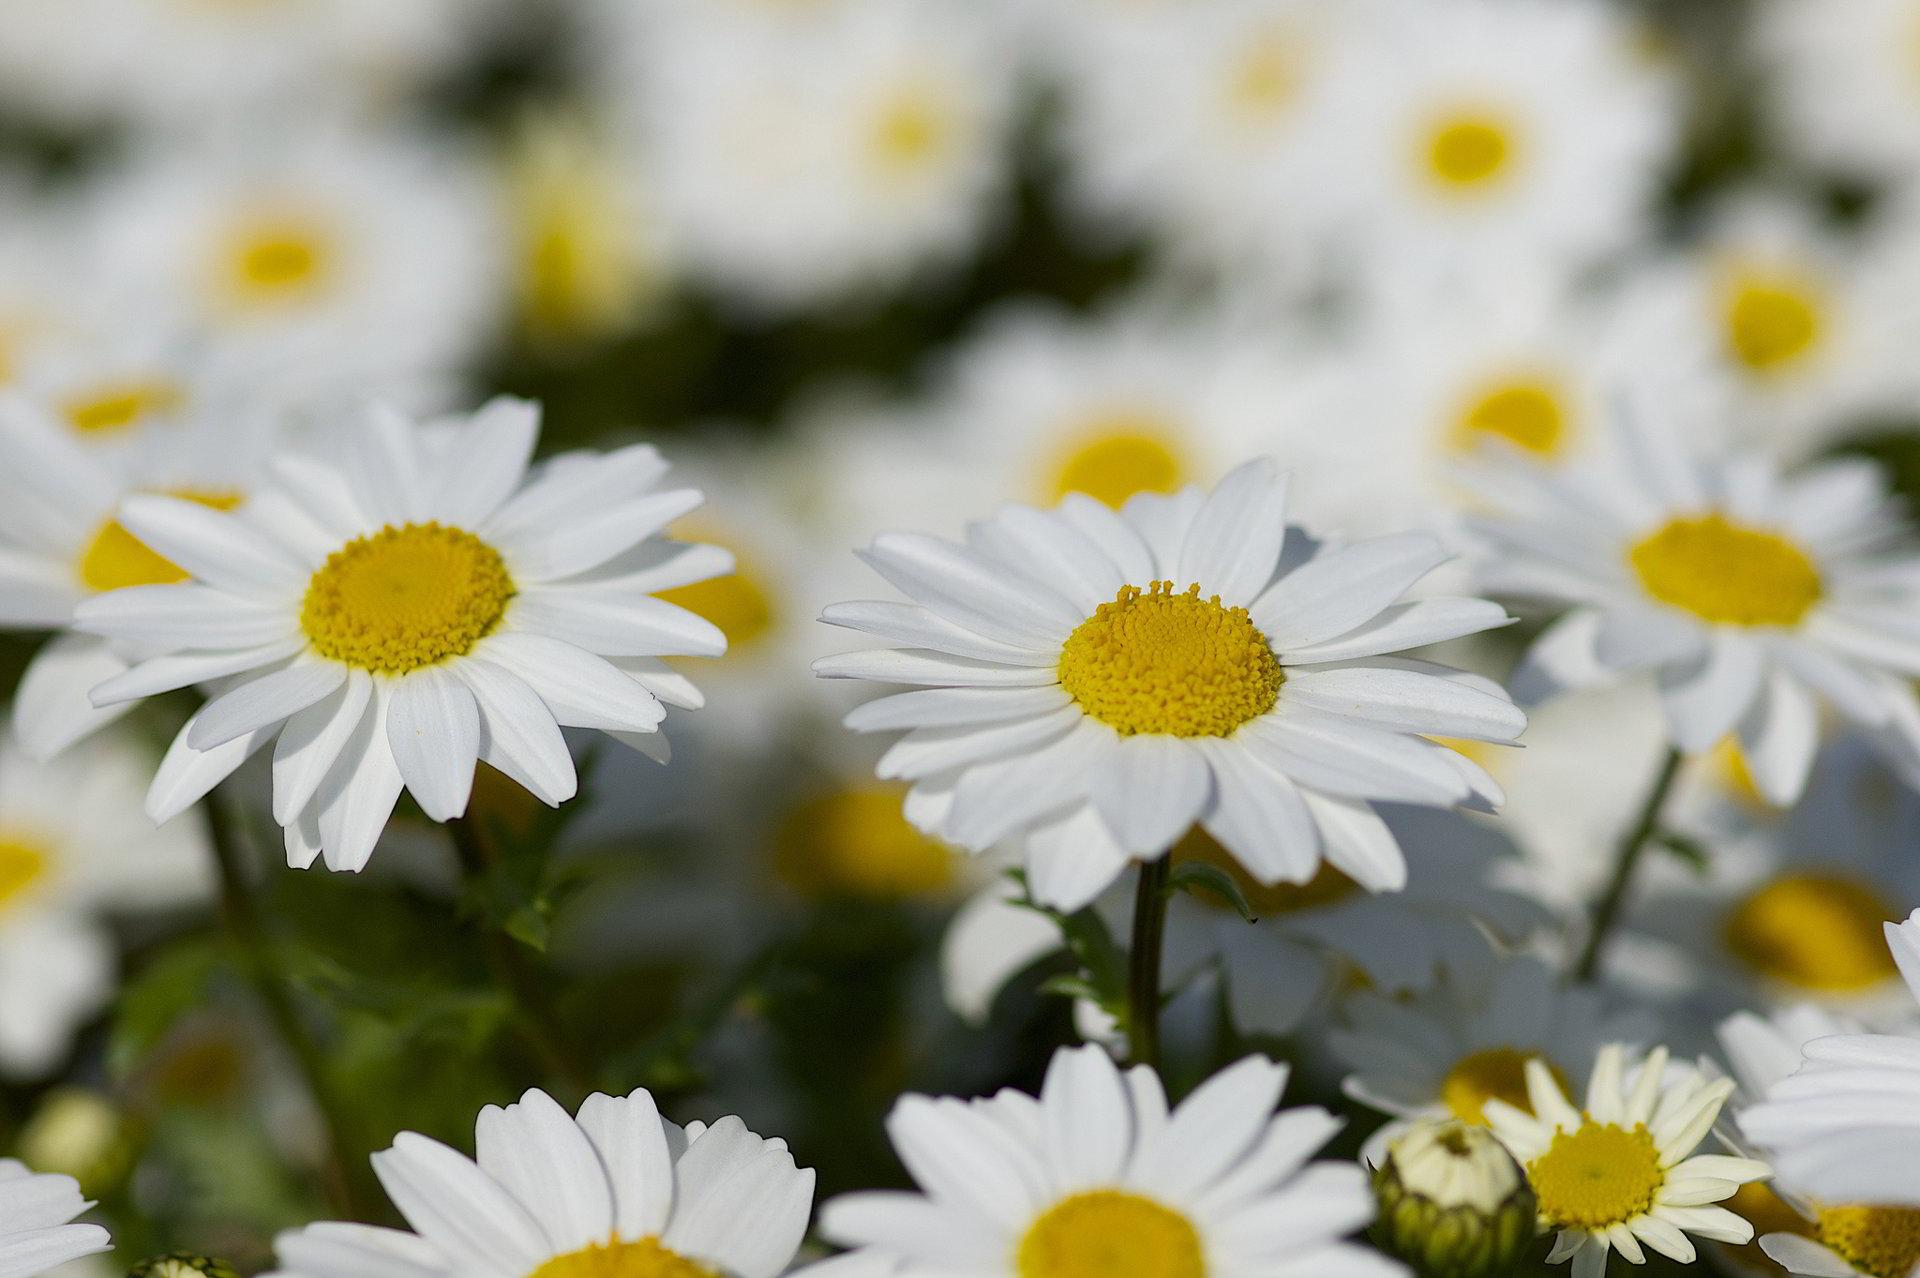 hinh anh hoa cuc dep 9